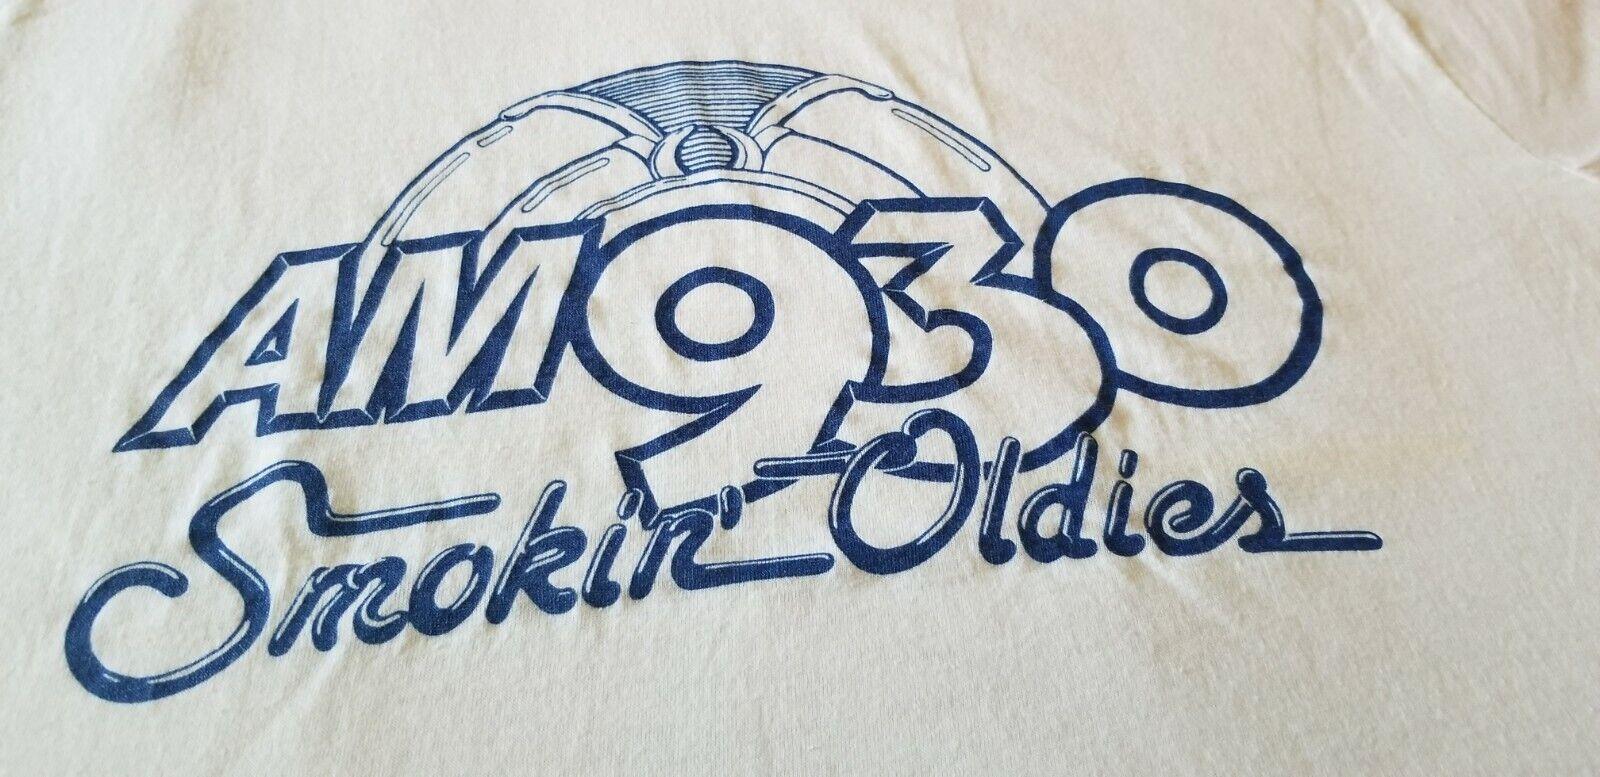 AM 930 SMOKIN OLDIES VINTAGE 80S RADIO STATION TEE SHIRT CLEAN LARGE